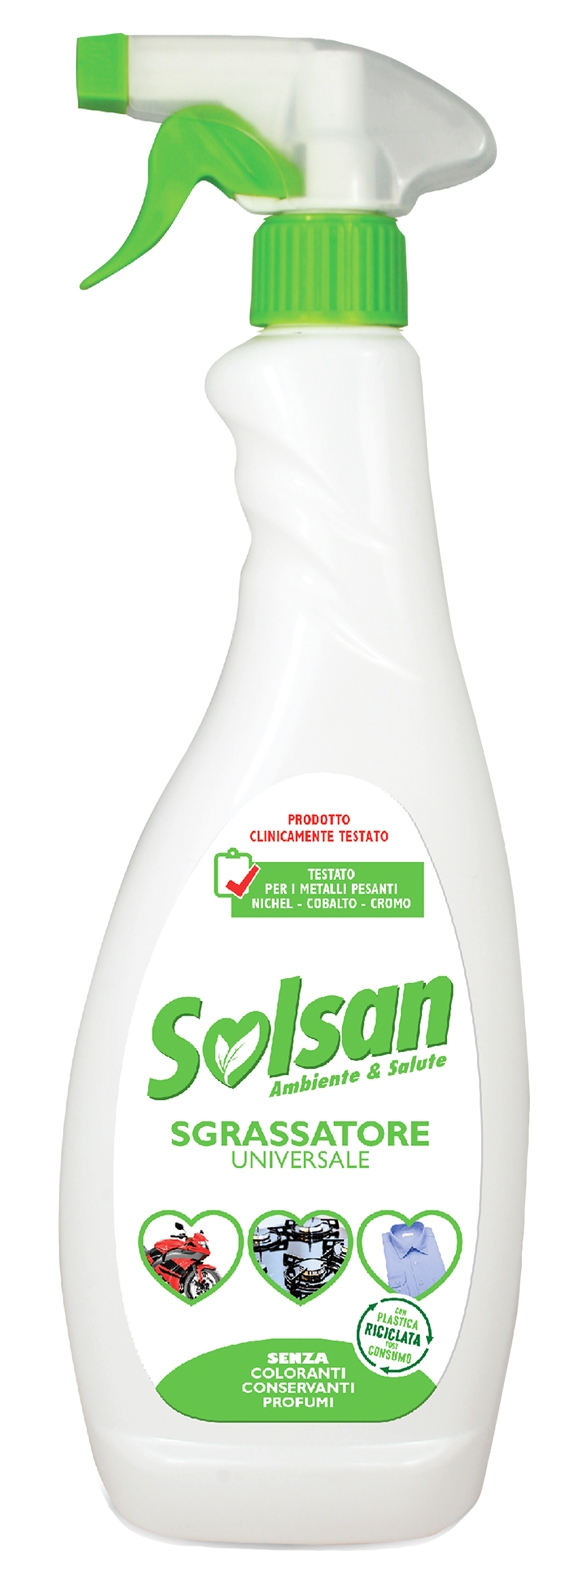 Sgrassatore universale lt 0,75 Solsan